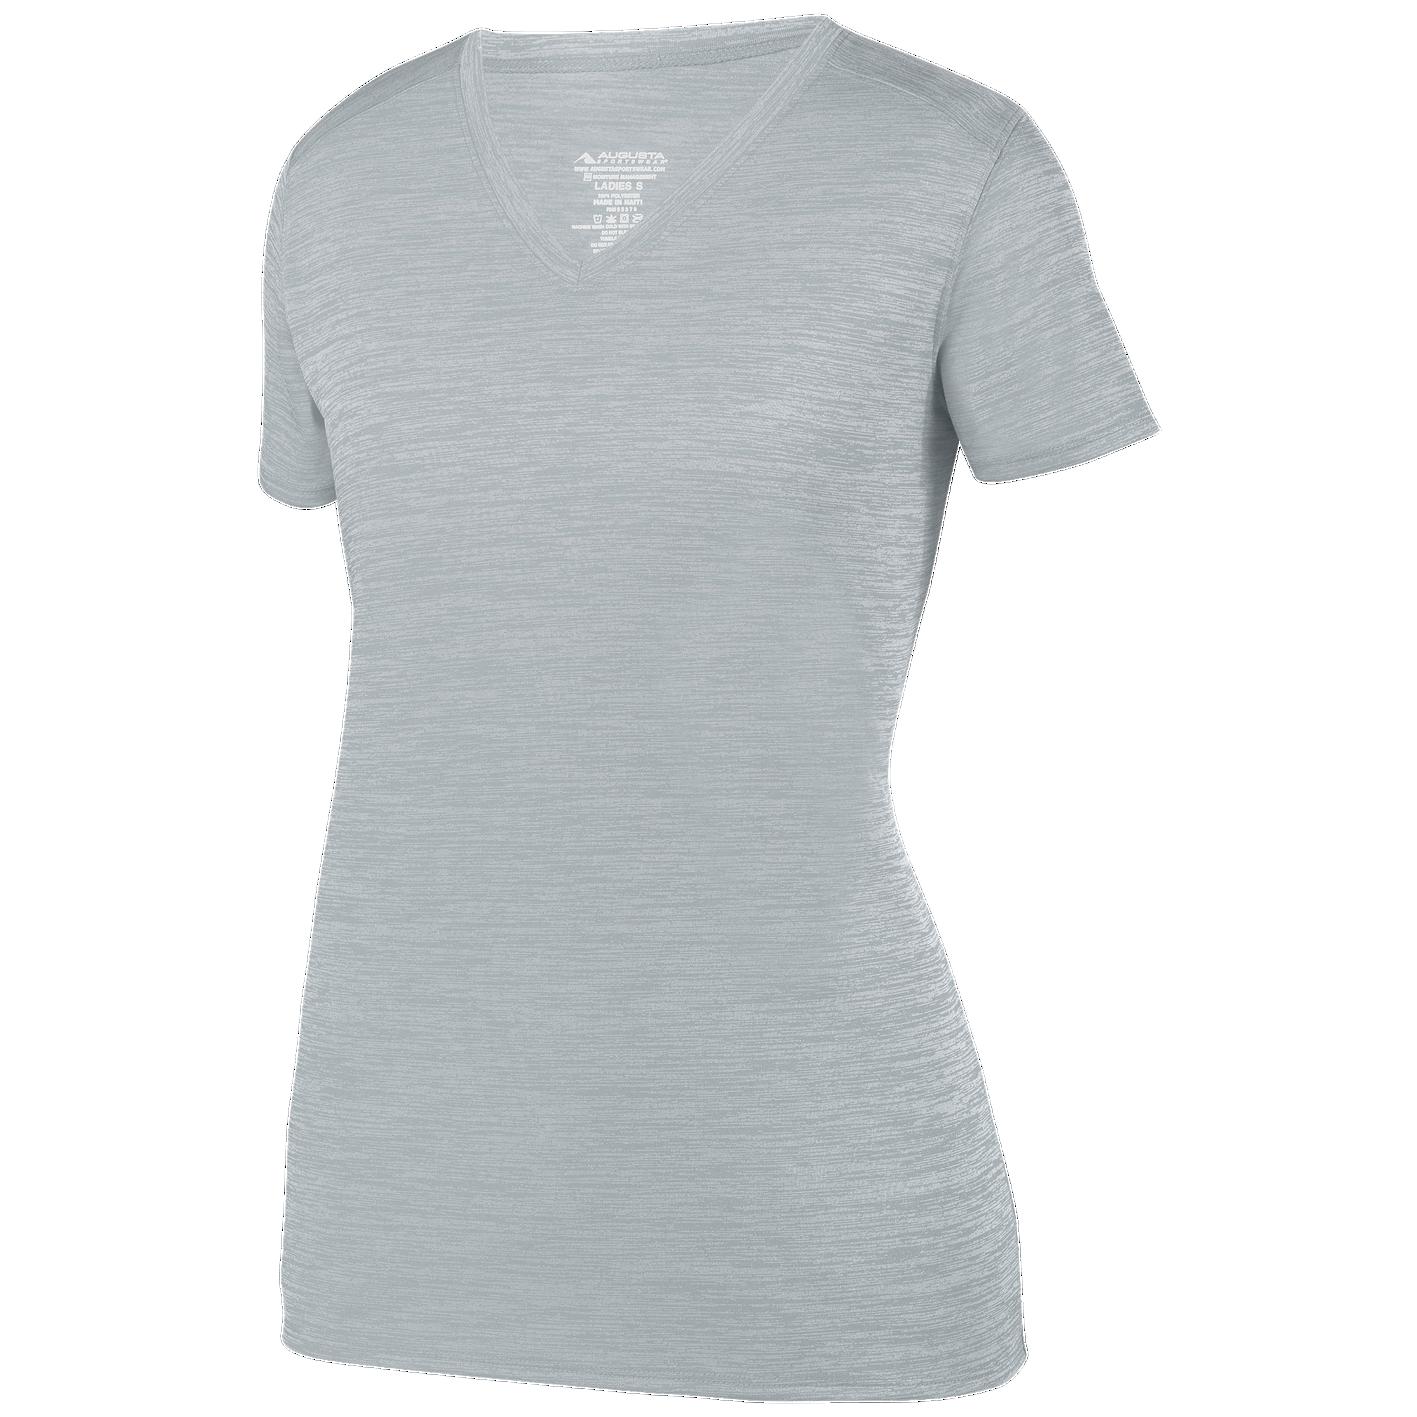 3b29a085990f Augusta Sportswear Team Heather Training T-Shirt - Women's - For All ...